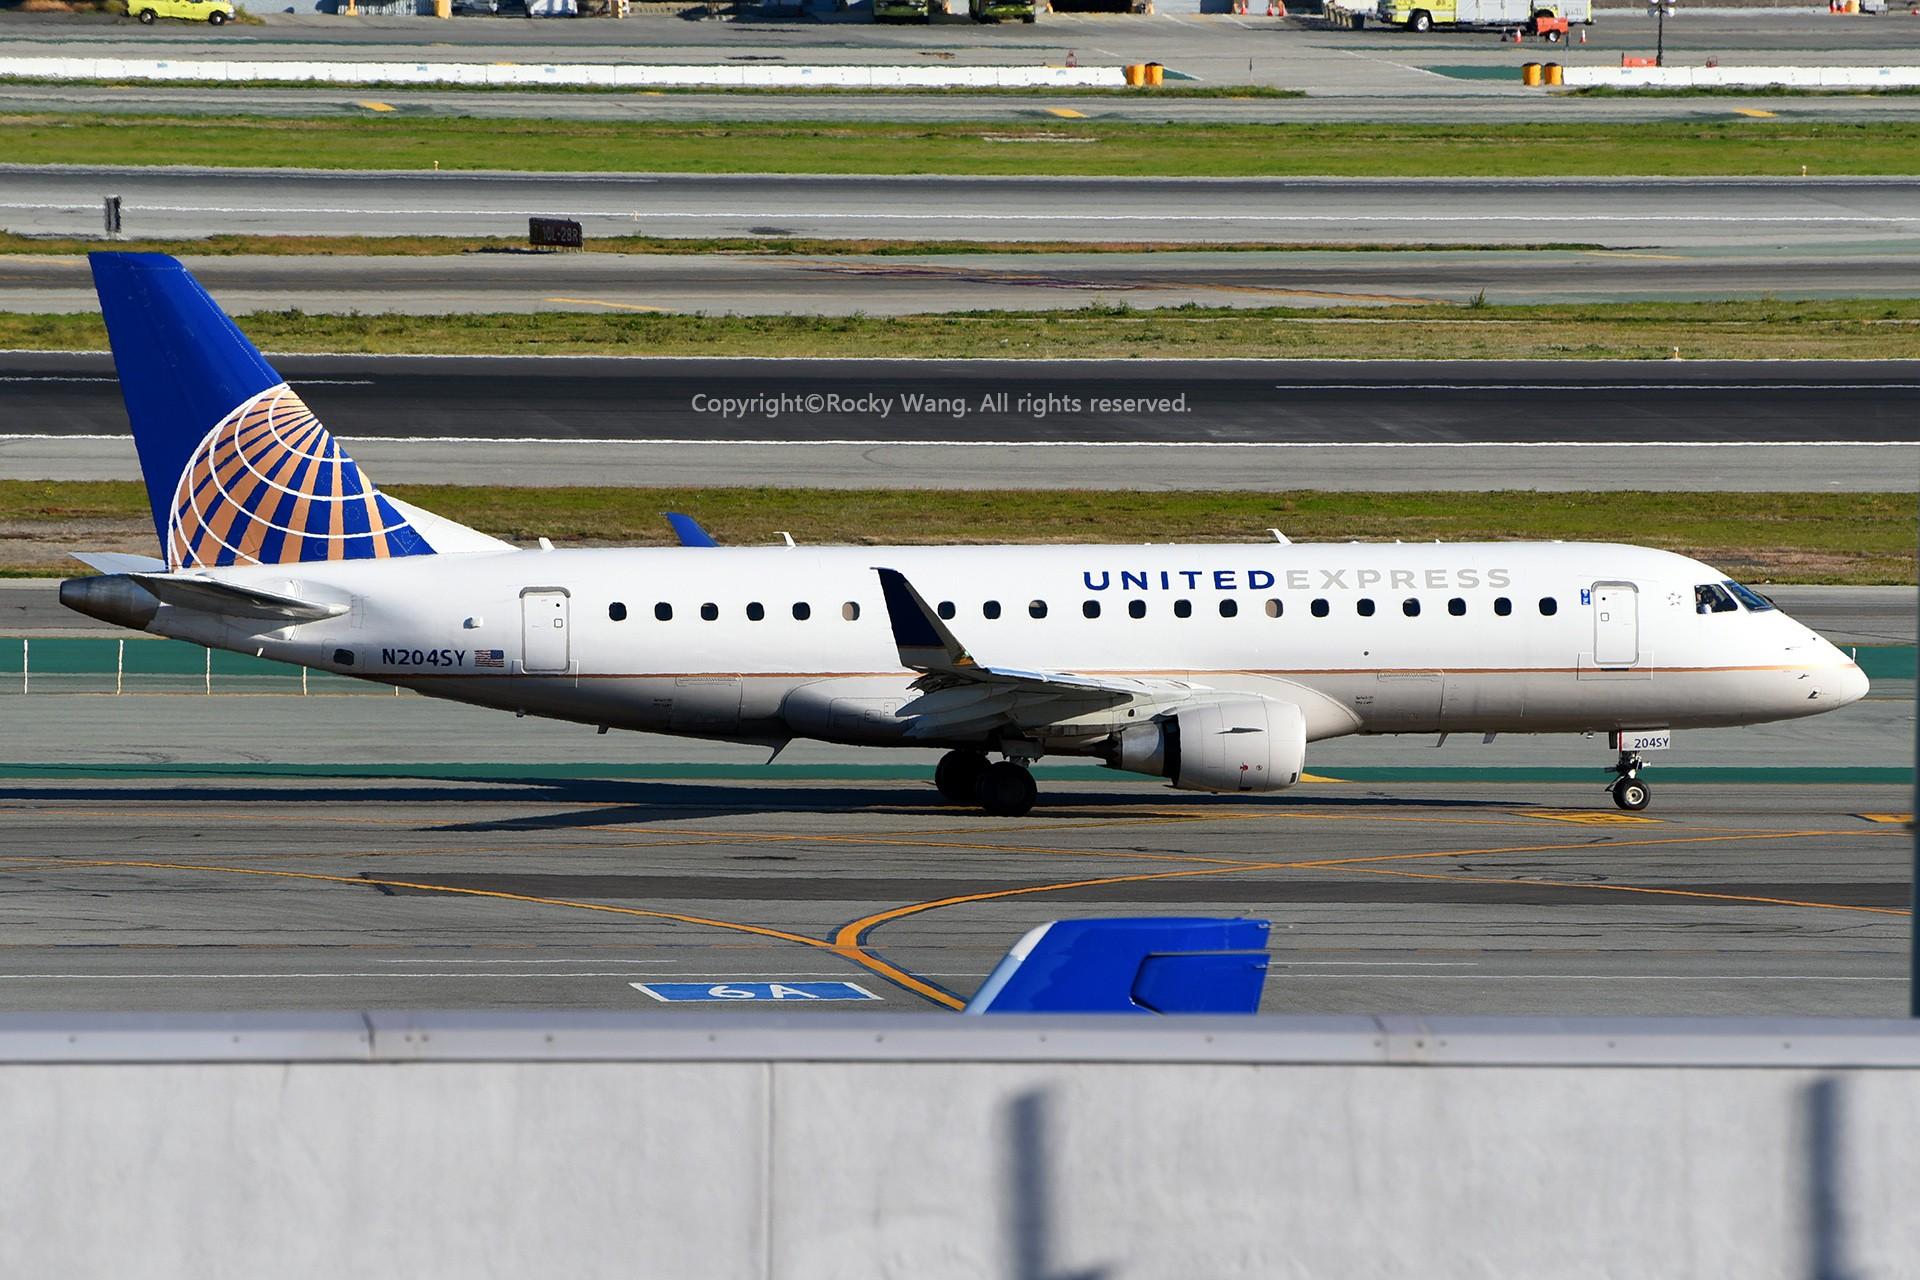 Re:[原创]窄体连连看 EMBRAER 170-200LR N204SY 美国旧金山机场